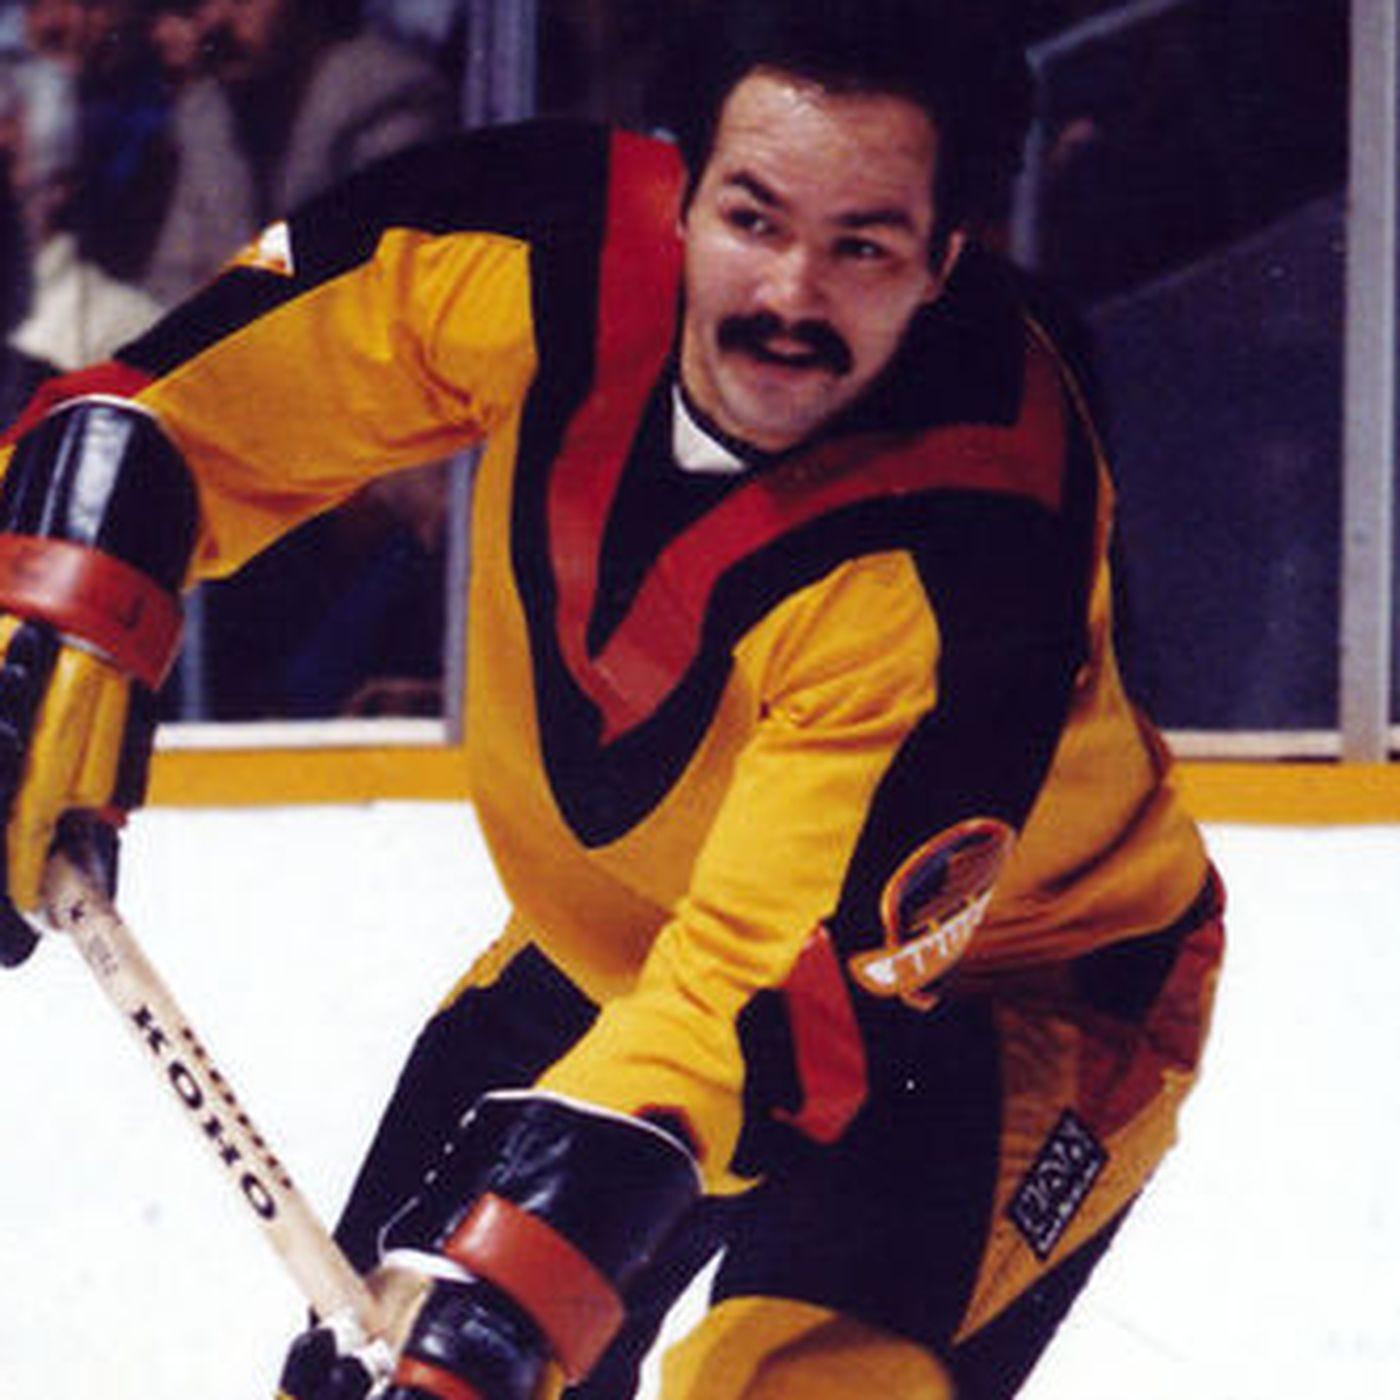 Top 10 Canucks Draft Picks: #8, Harold Snepsts - Nucks Misconduct